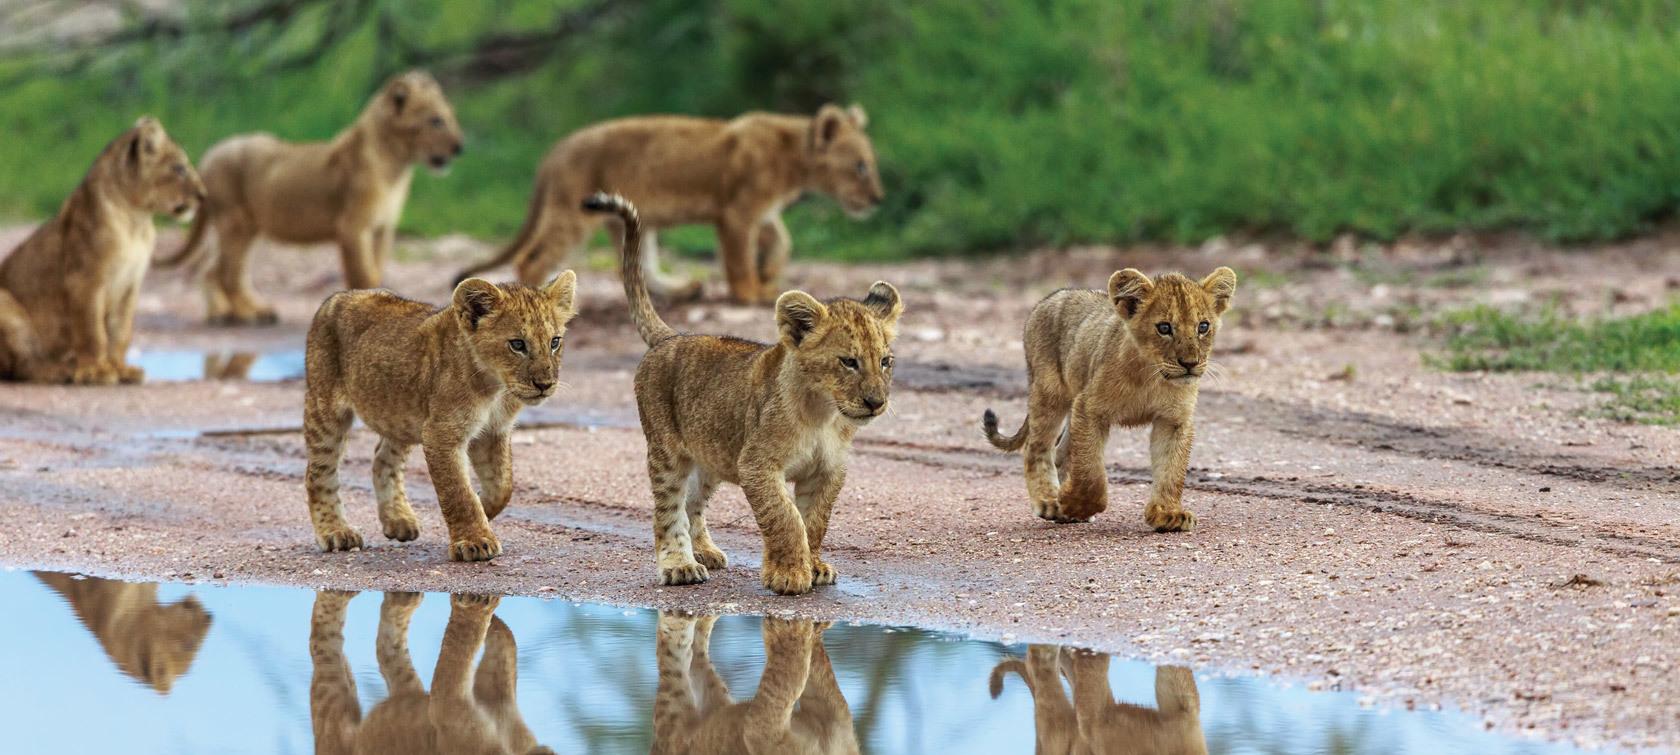 Kenya Amp Tanzania Wildlife Safari A Luxury Small Group